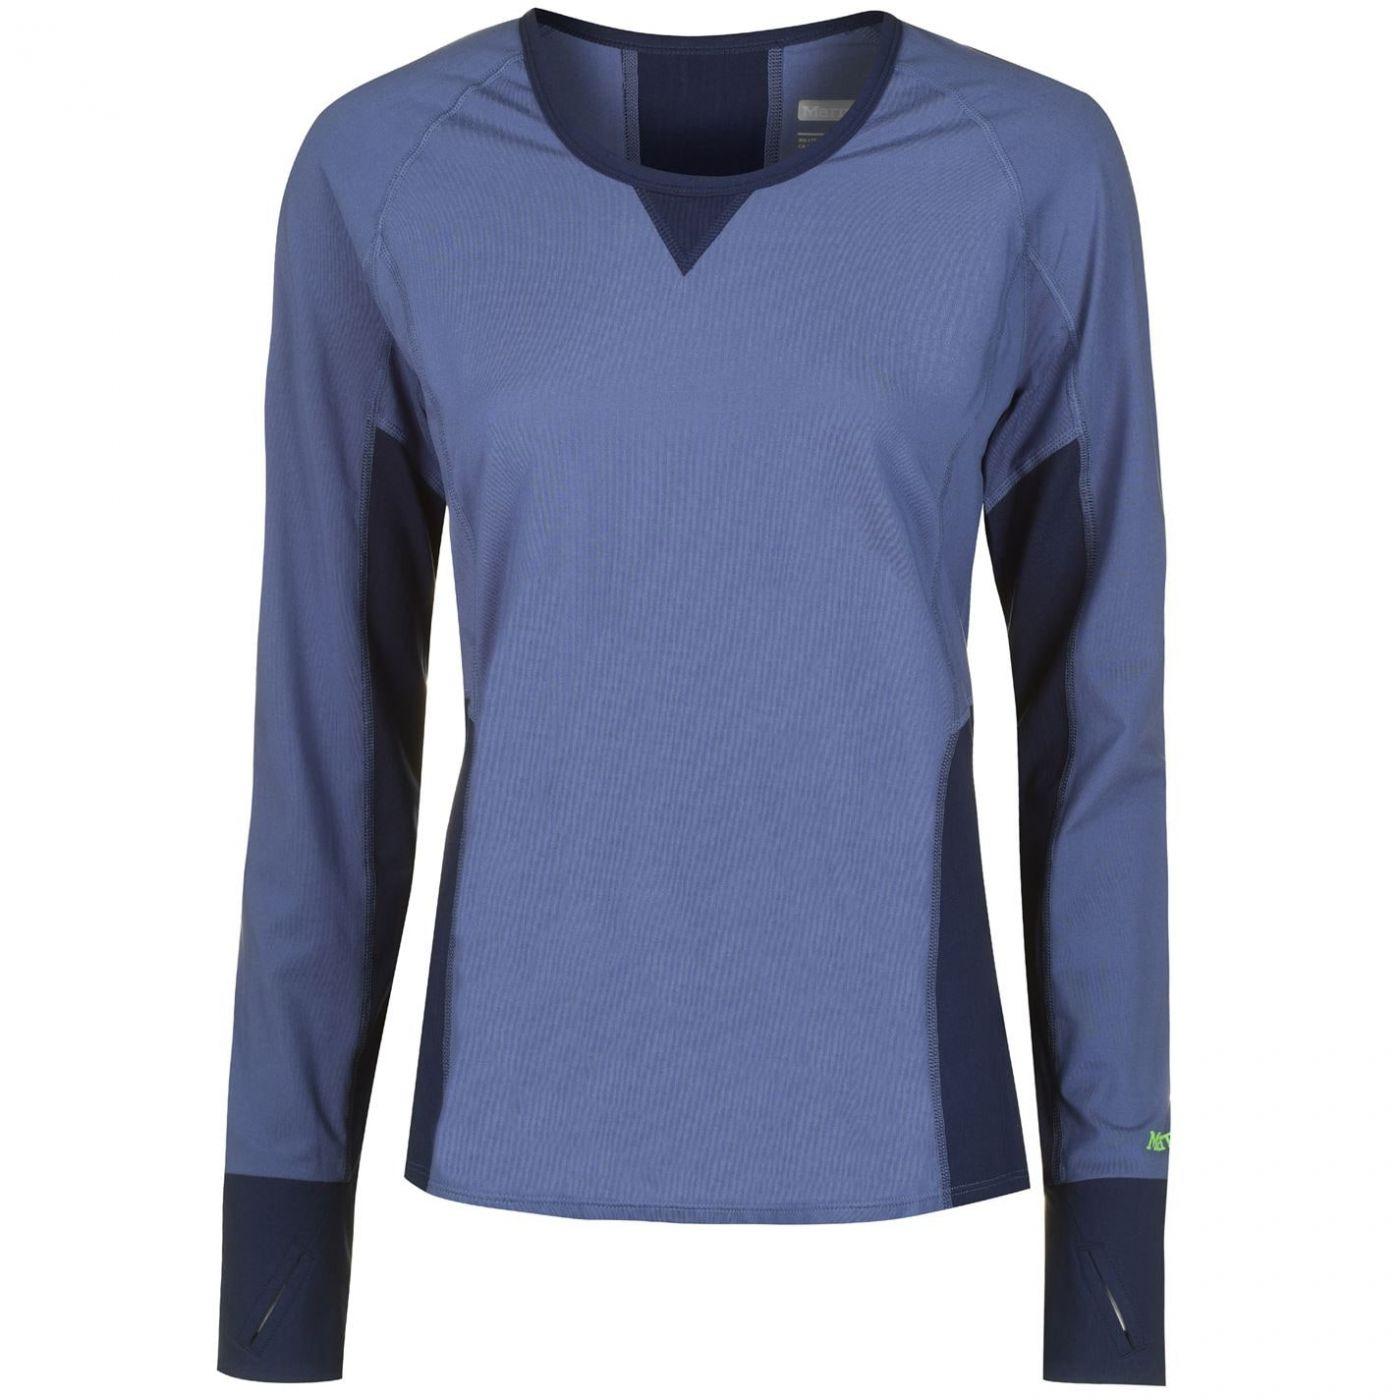 Marmot Lana Long Sleeve T Shirt Ladies